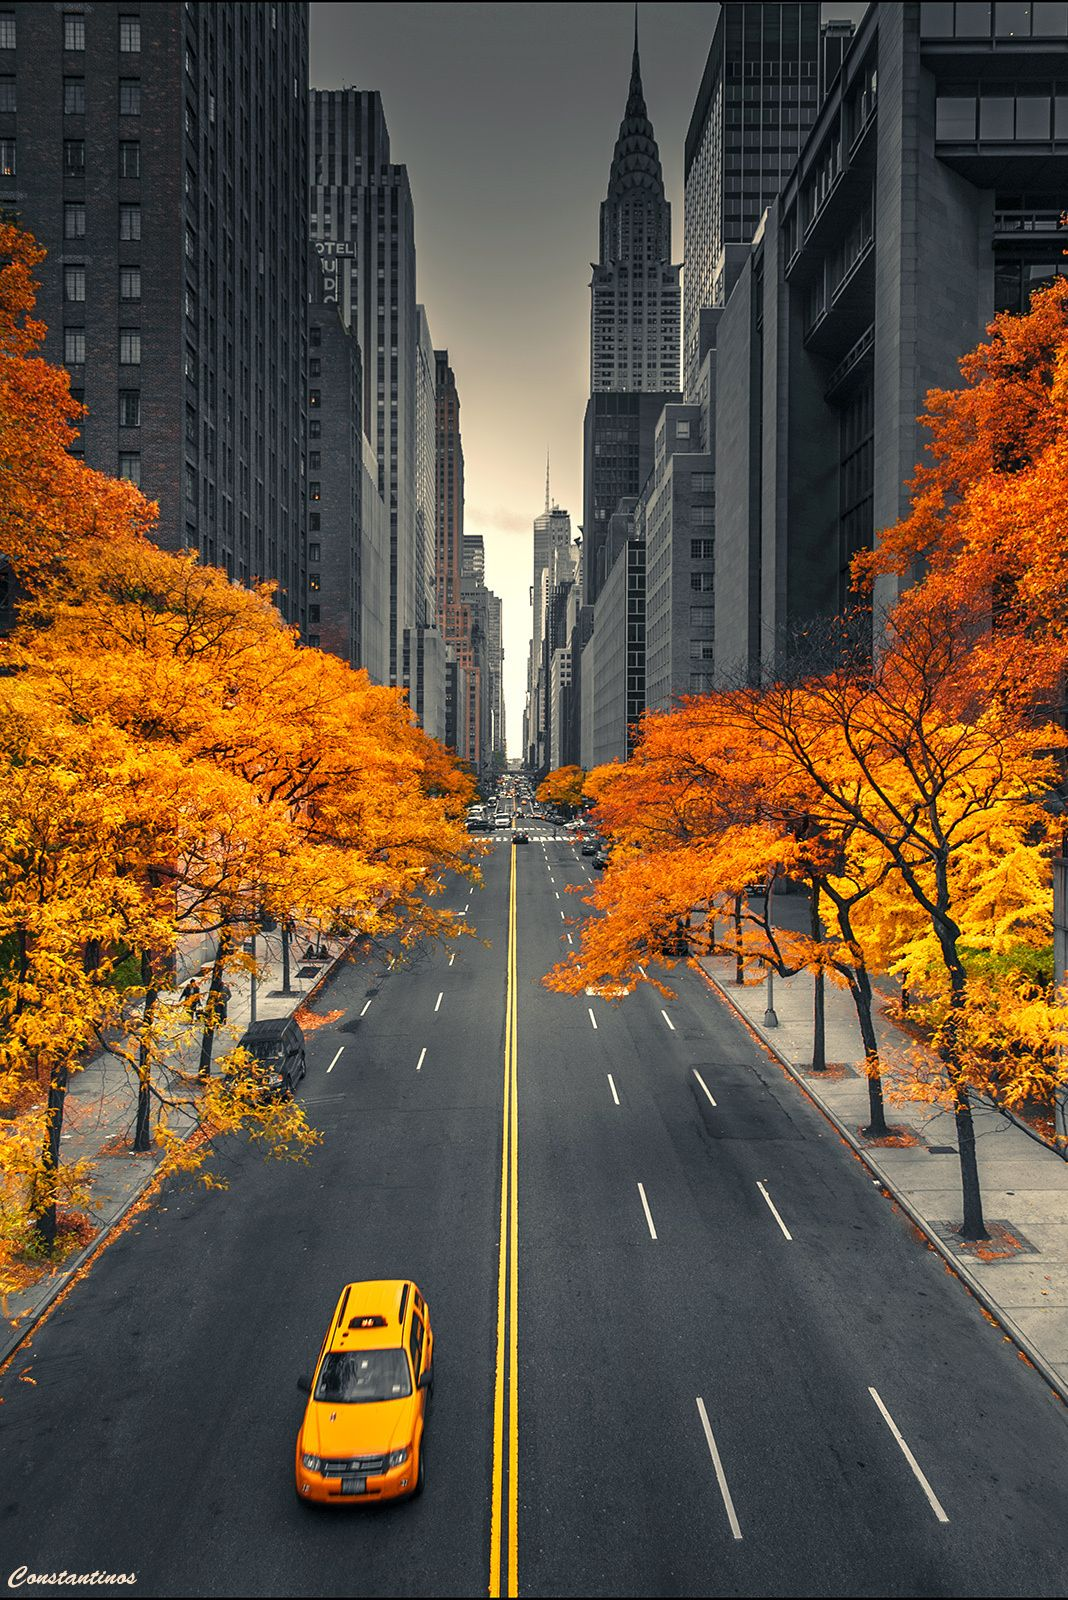 New York Autumn Dreams Autumn In New York New York City Street Photography Urban